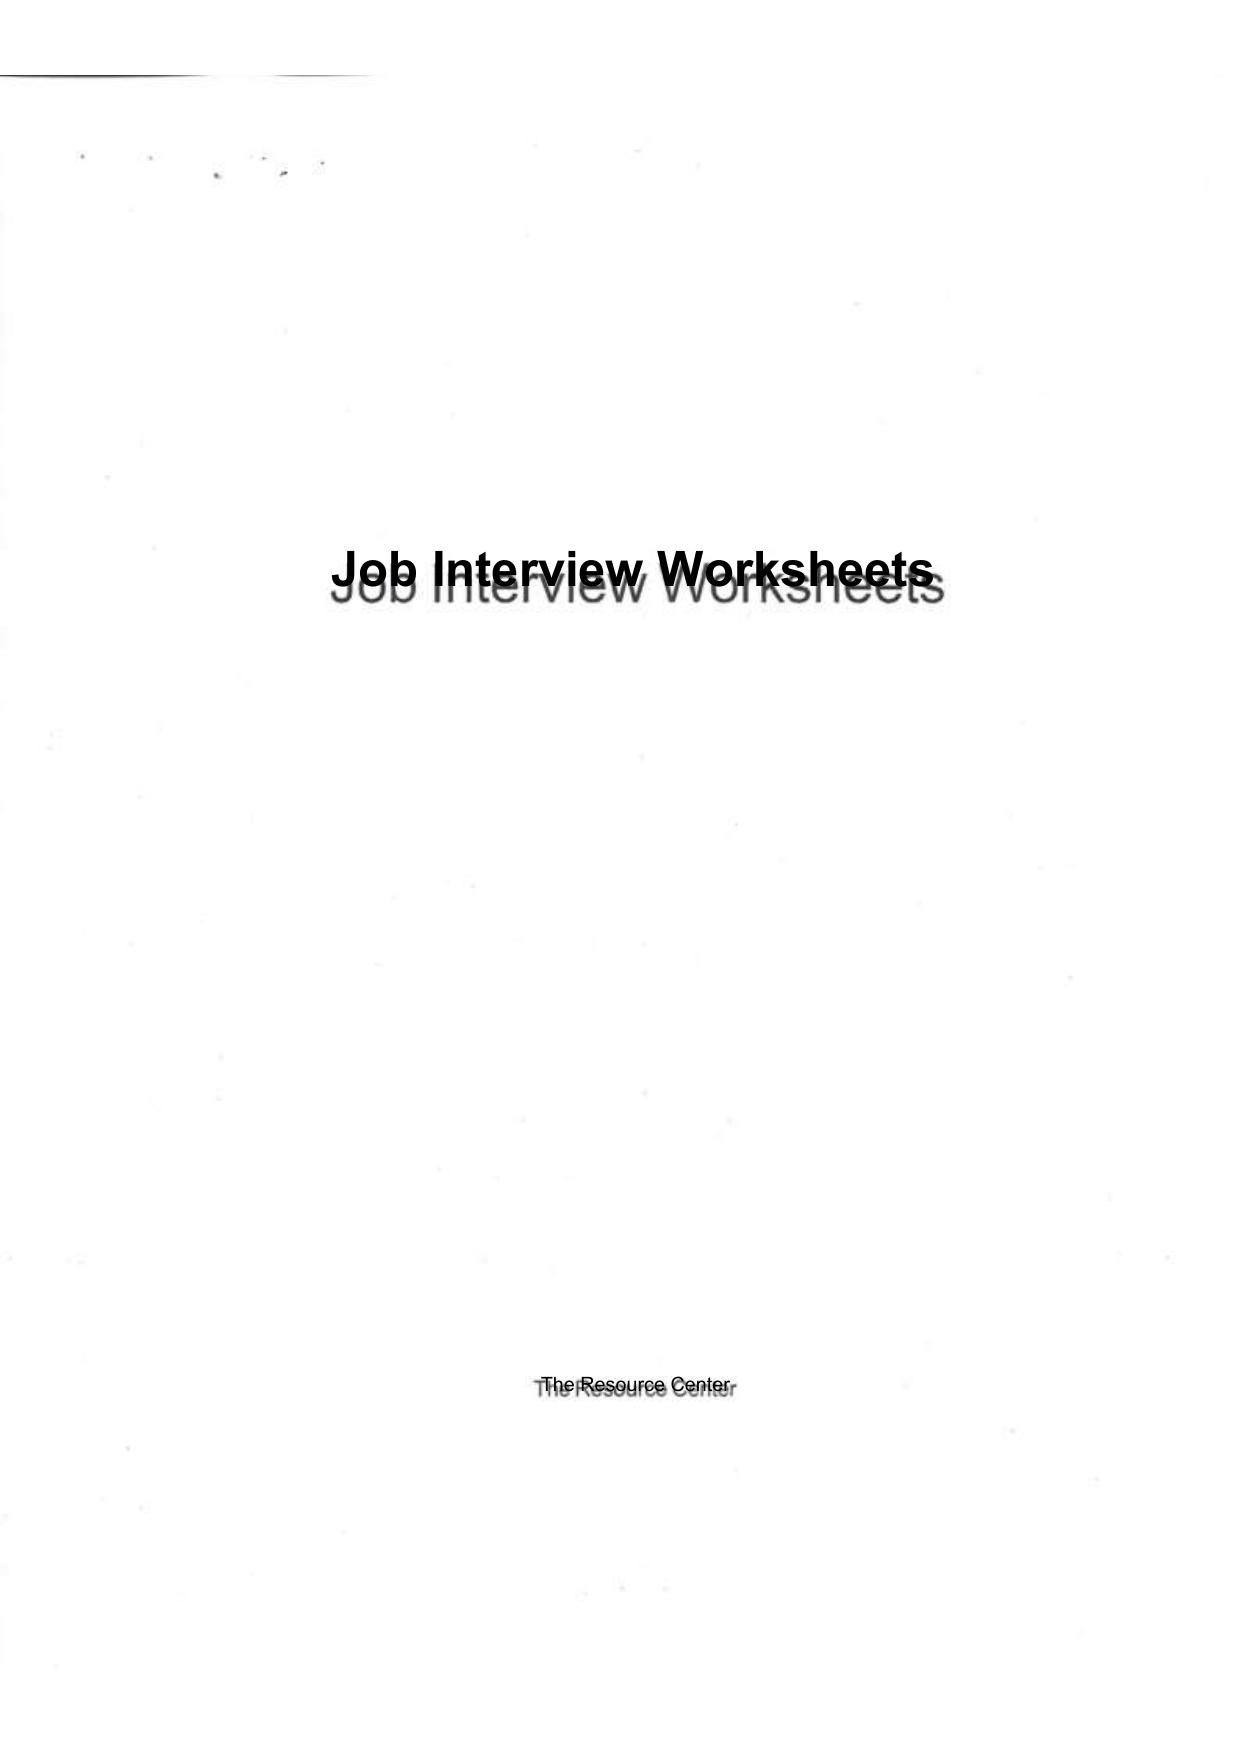 26 Job Interview Worksheets